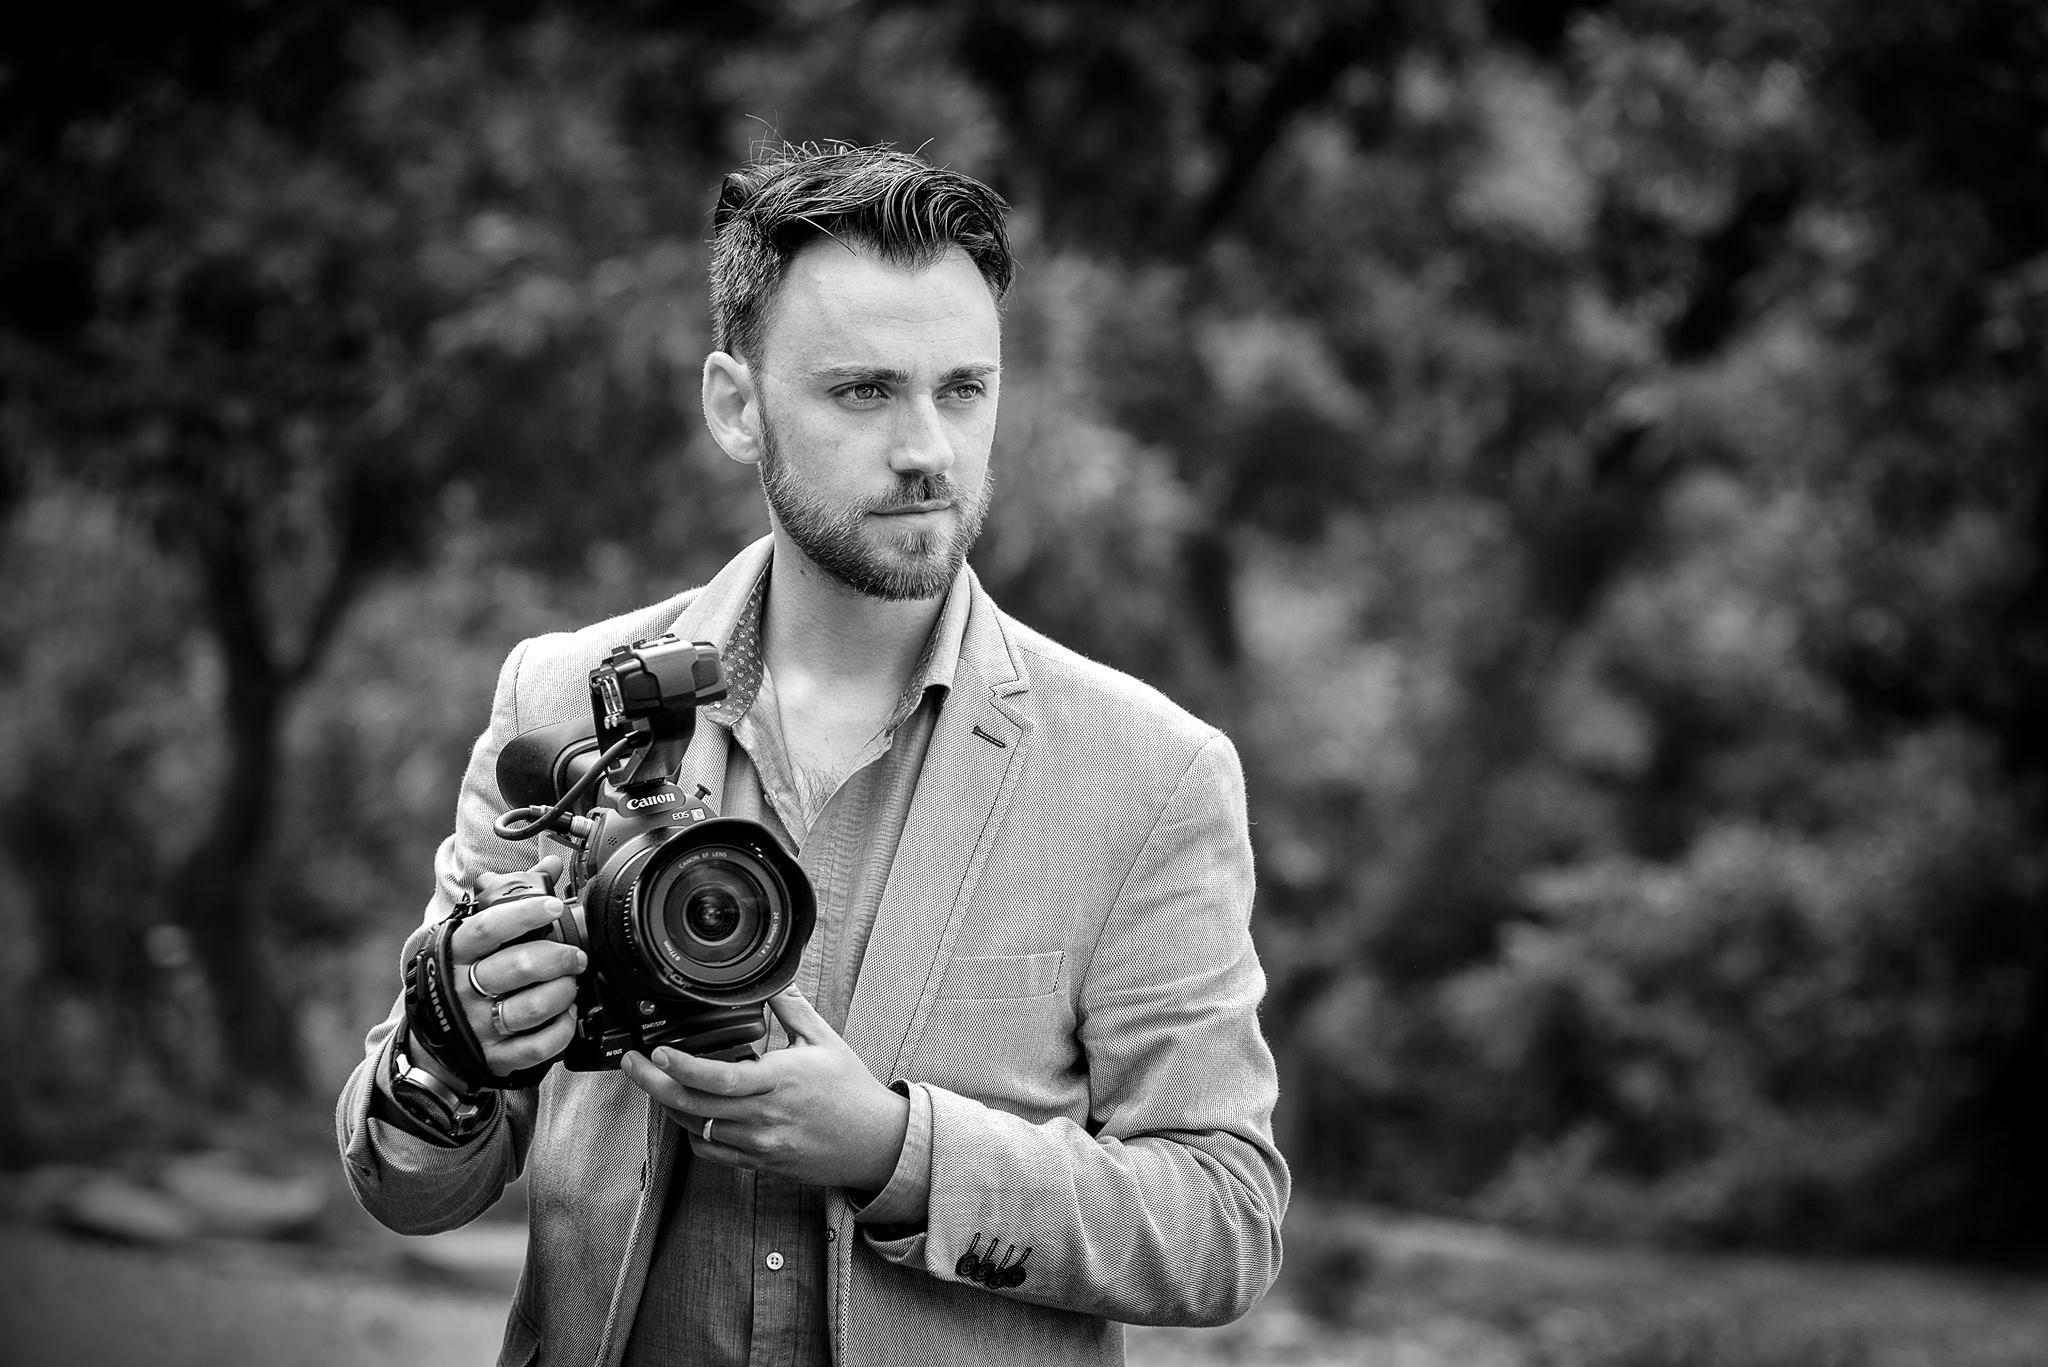 Bruno Tedeschi Filmmaker on wedding sicily